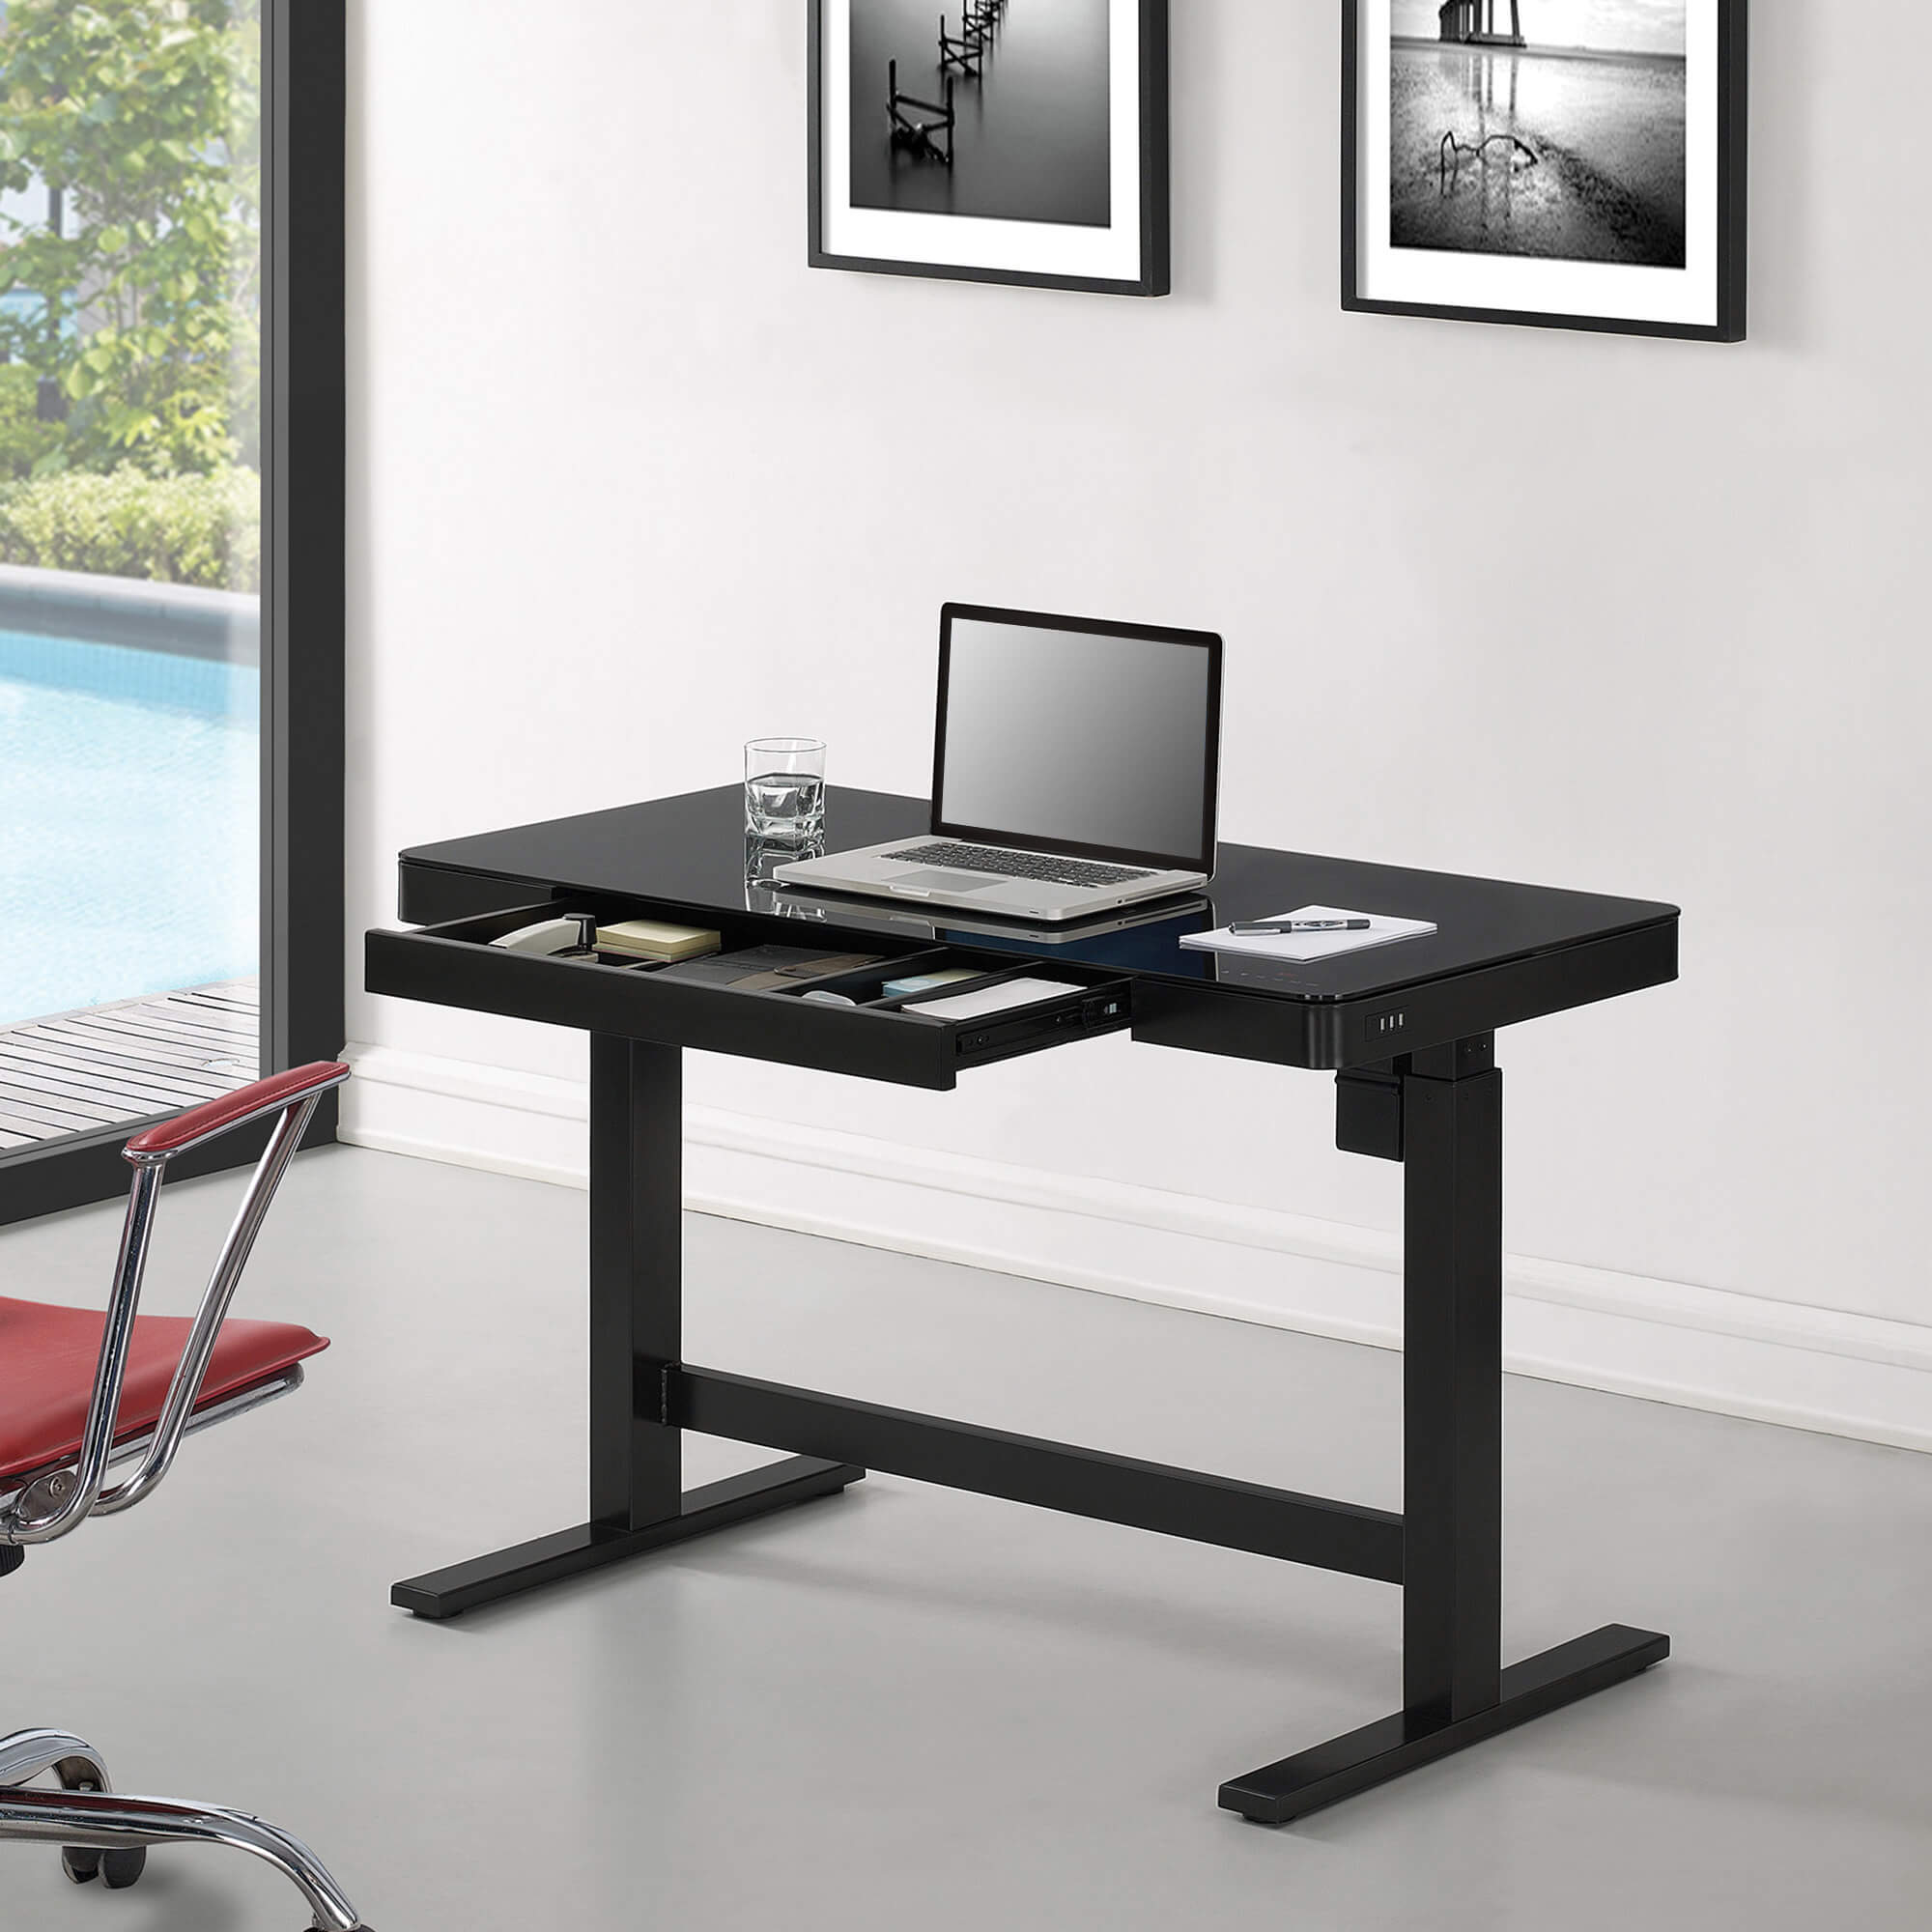 Costco standing desk